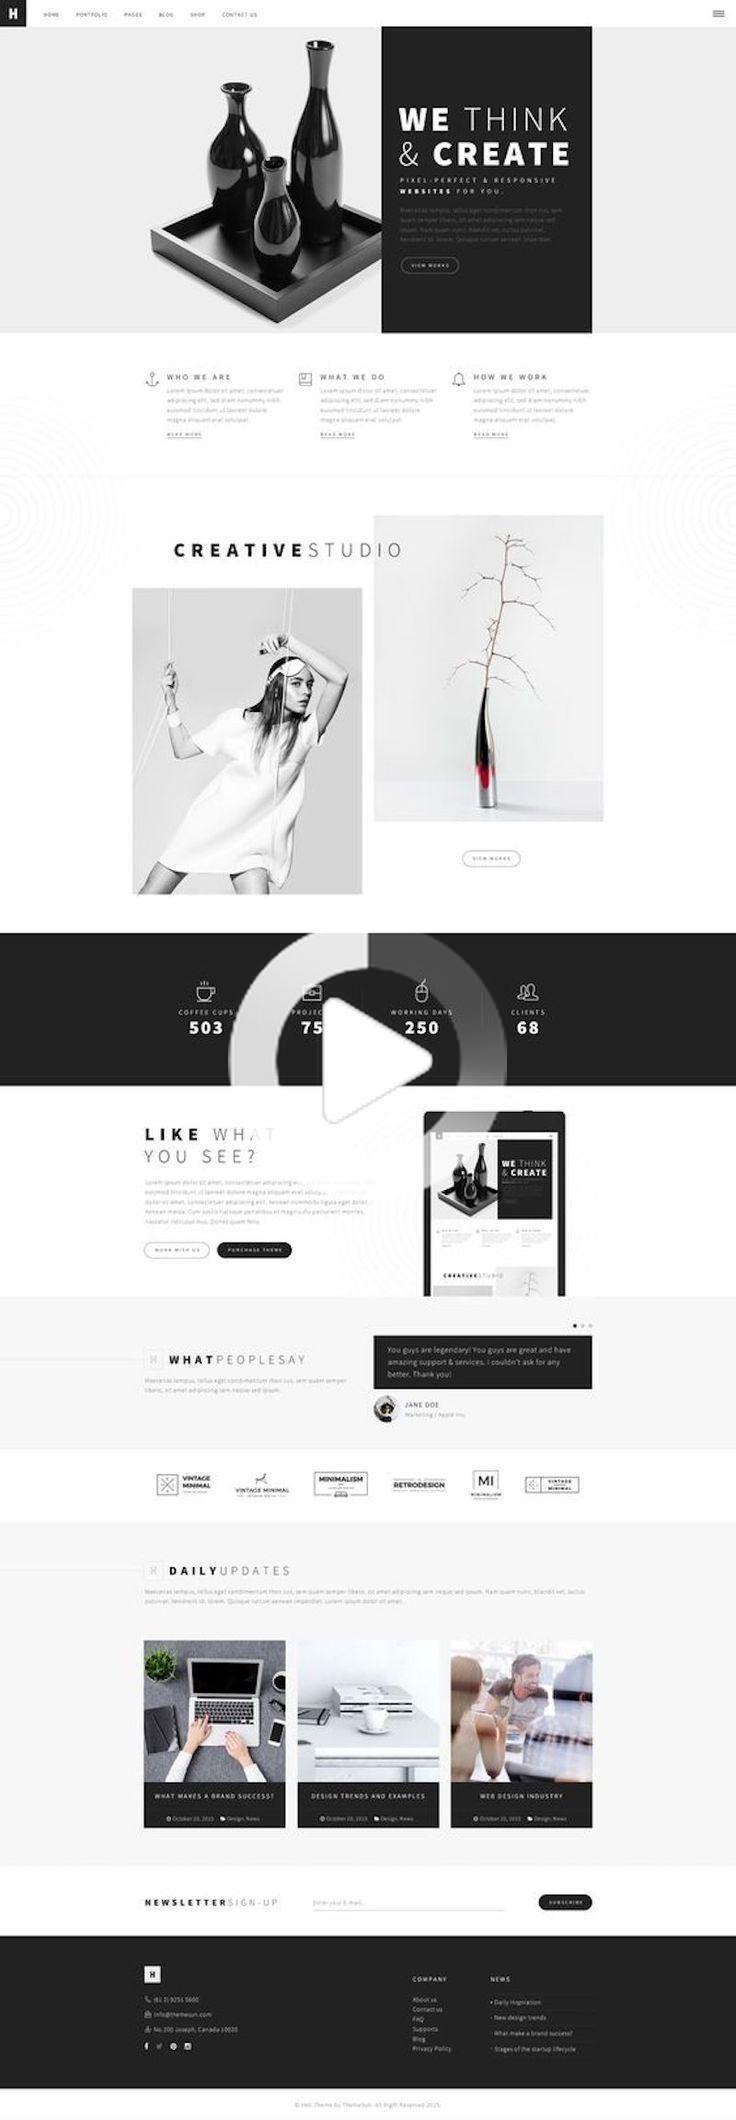 Concept Art Design Inspiration Web Design Inspiration 2020 Minimal Web Design Fo In 2020 Website Design Trends Minimalist Web Design Latest Website Design Trends